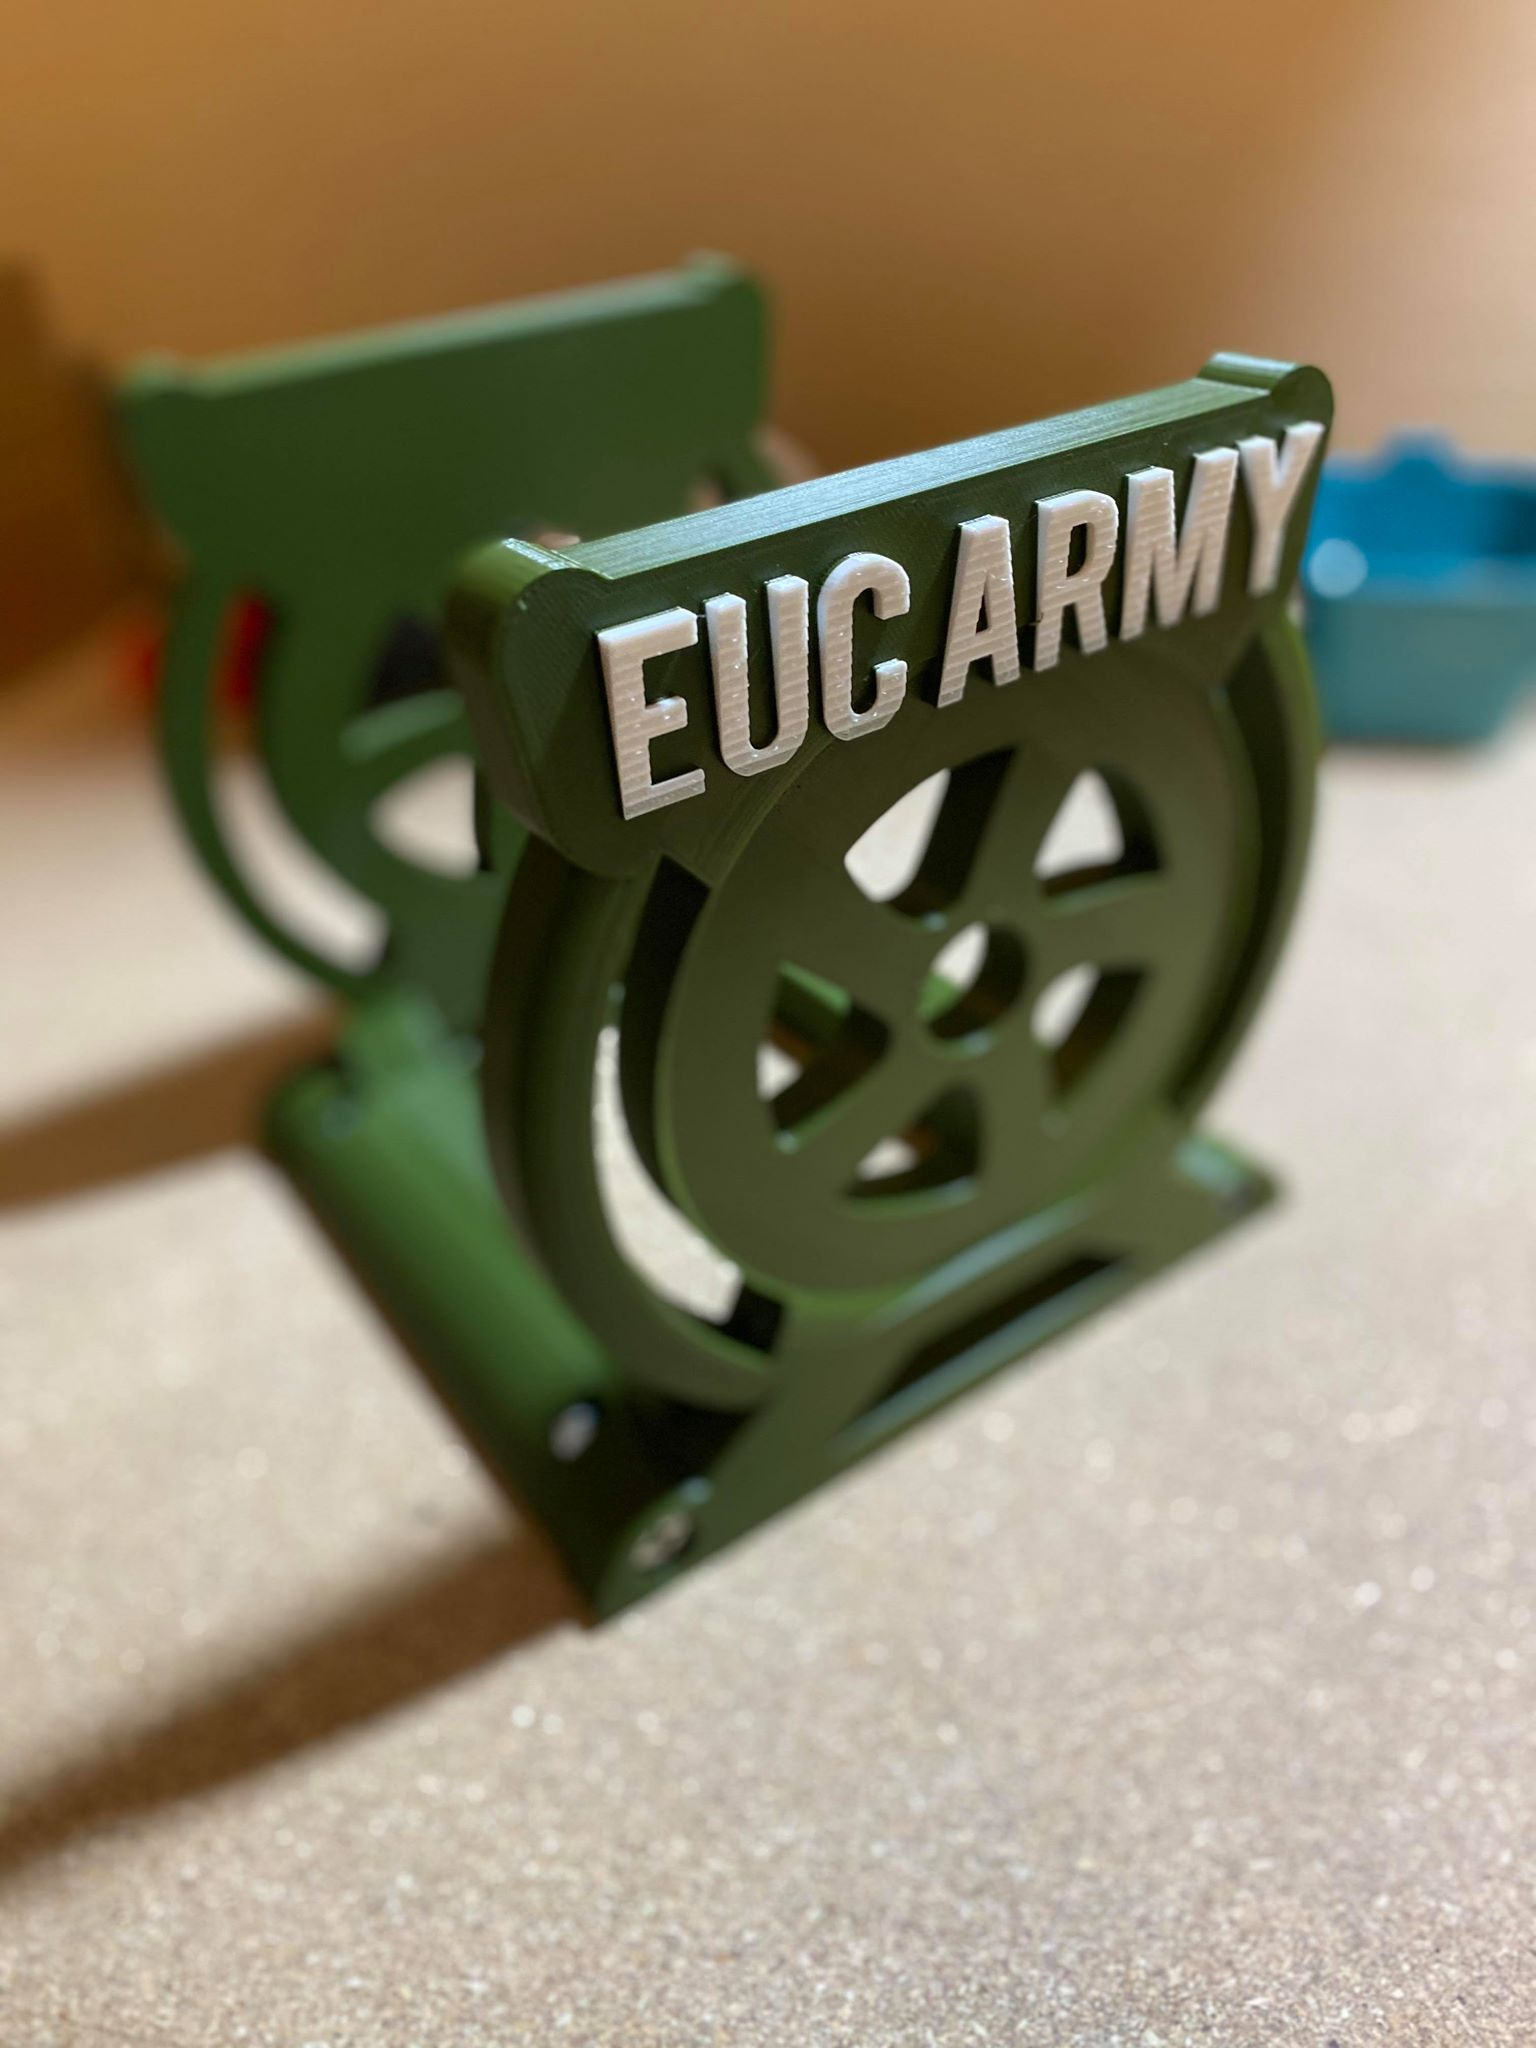 EUC Stand 3.9 Army Green Premium